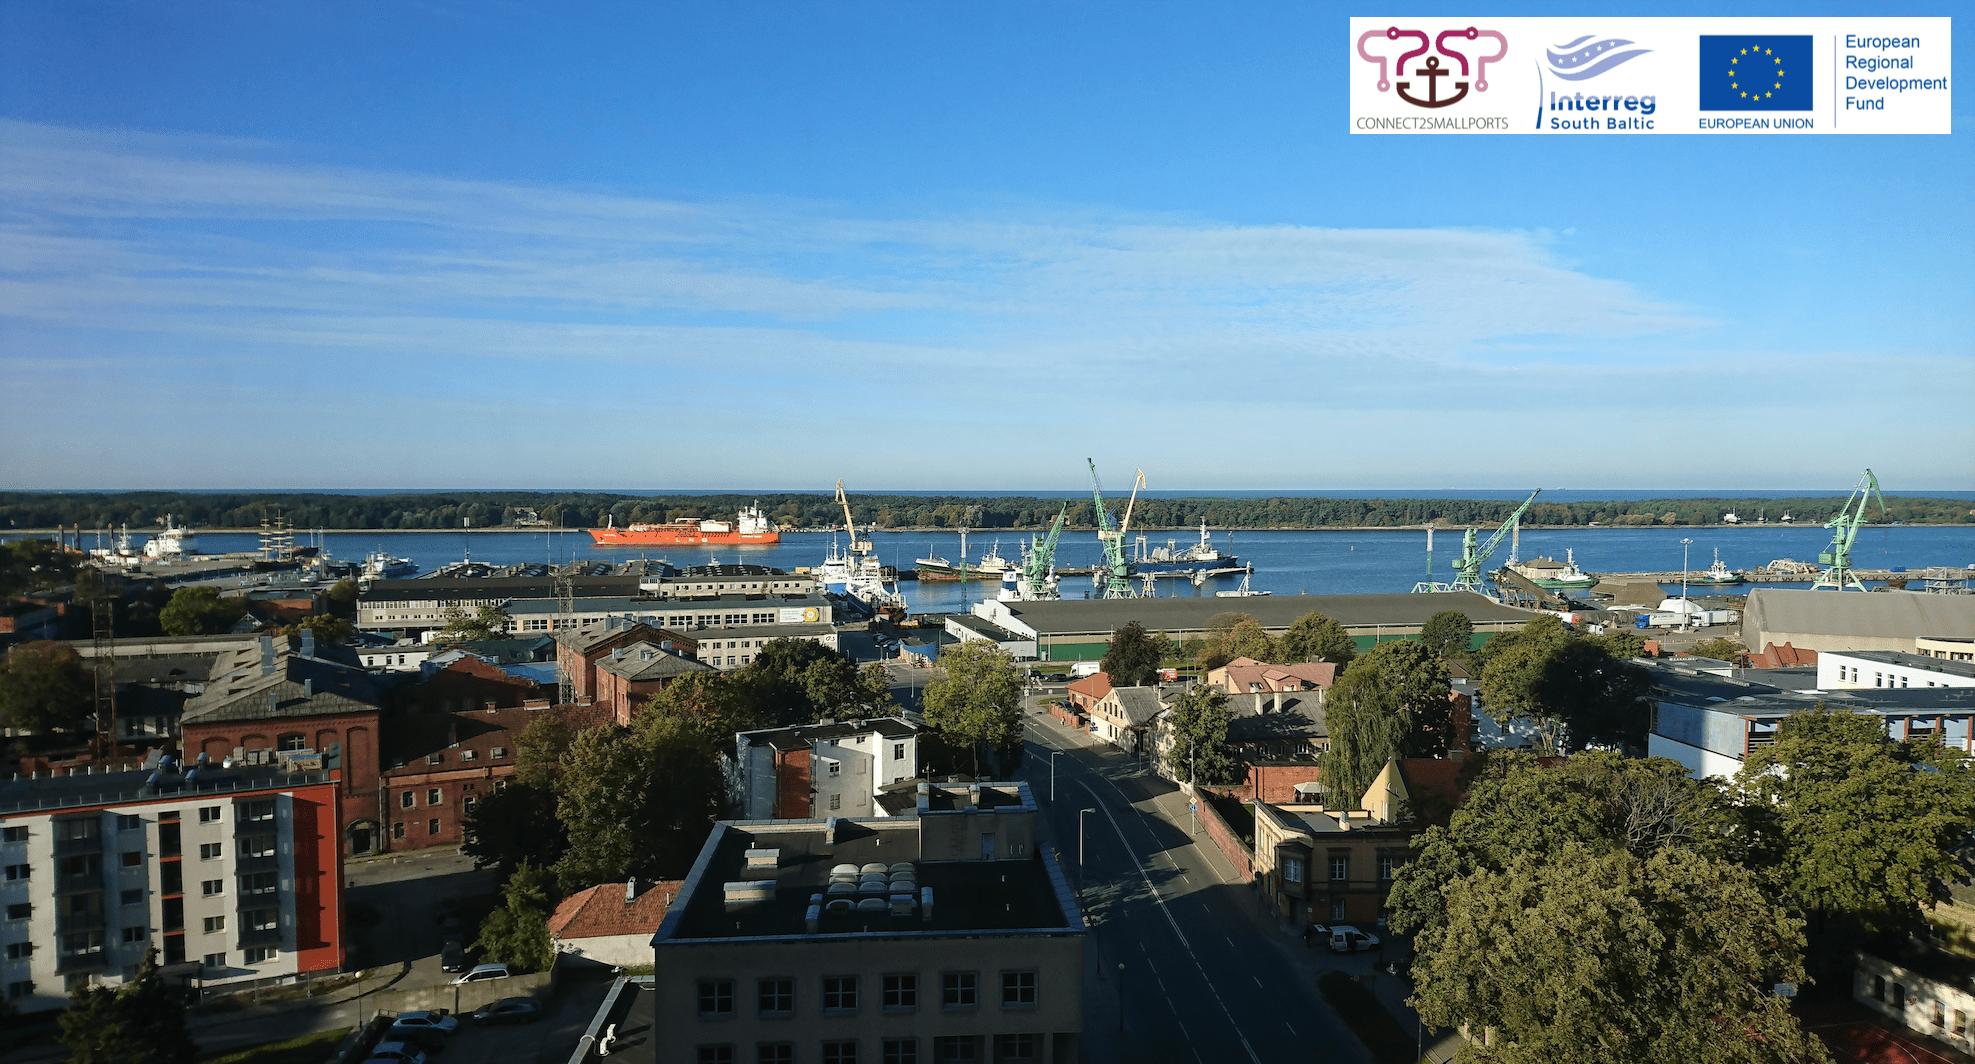 Environmental Monitoring System starts testing phase in Klaipeda